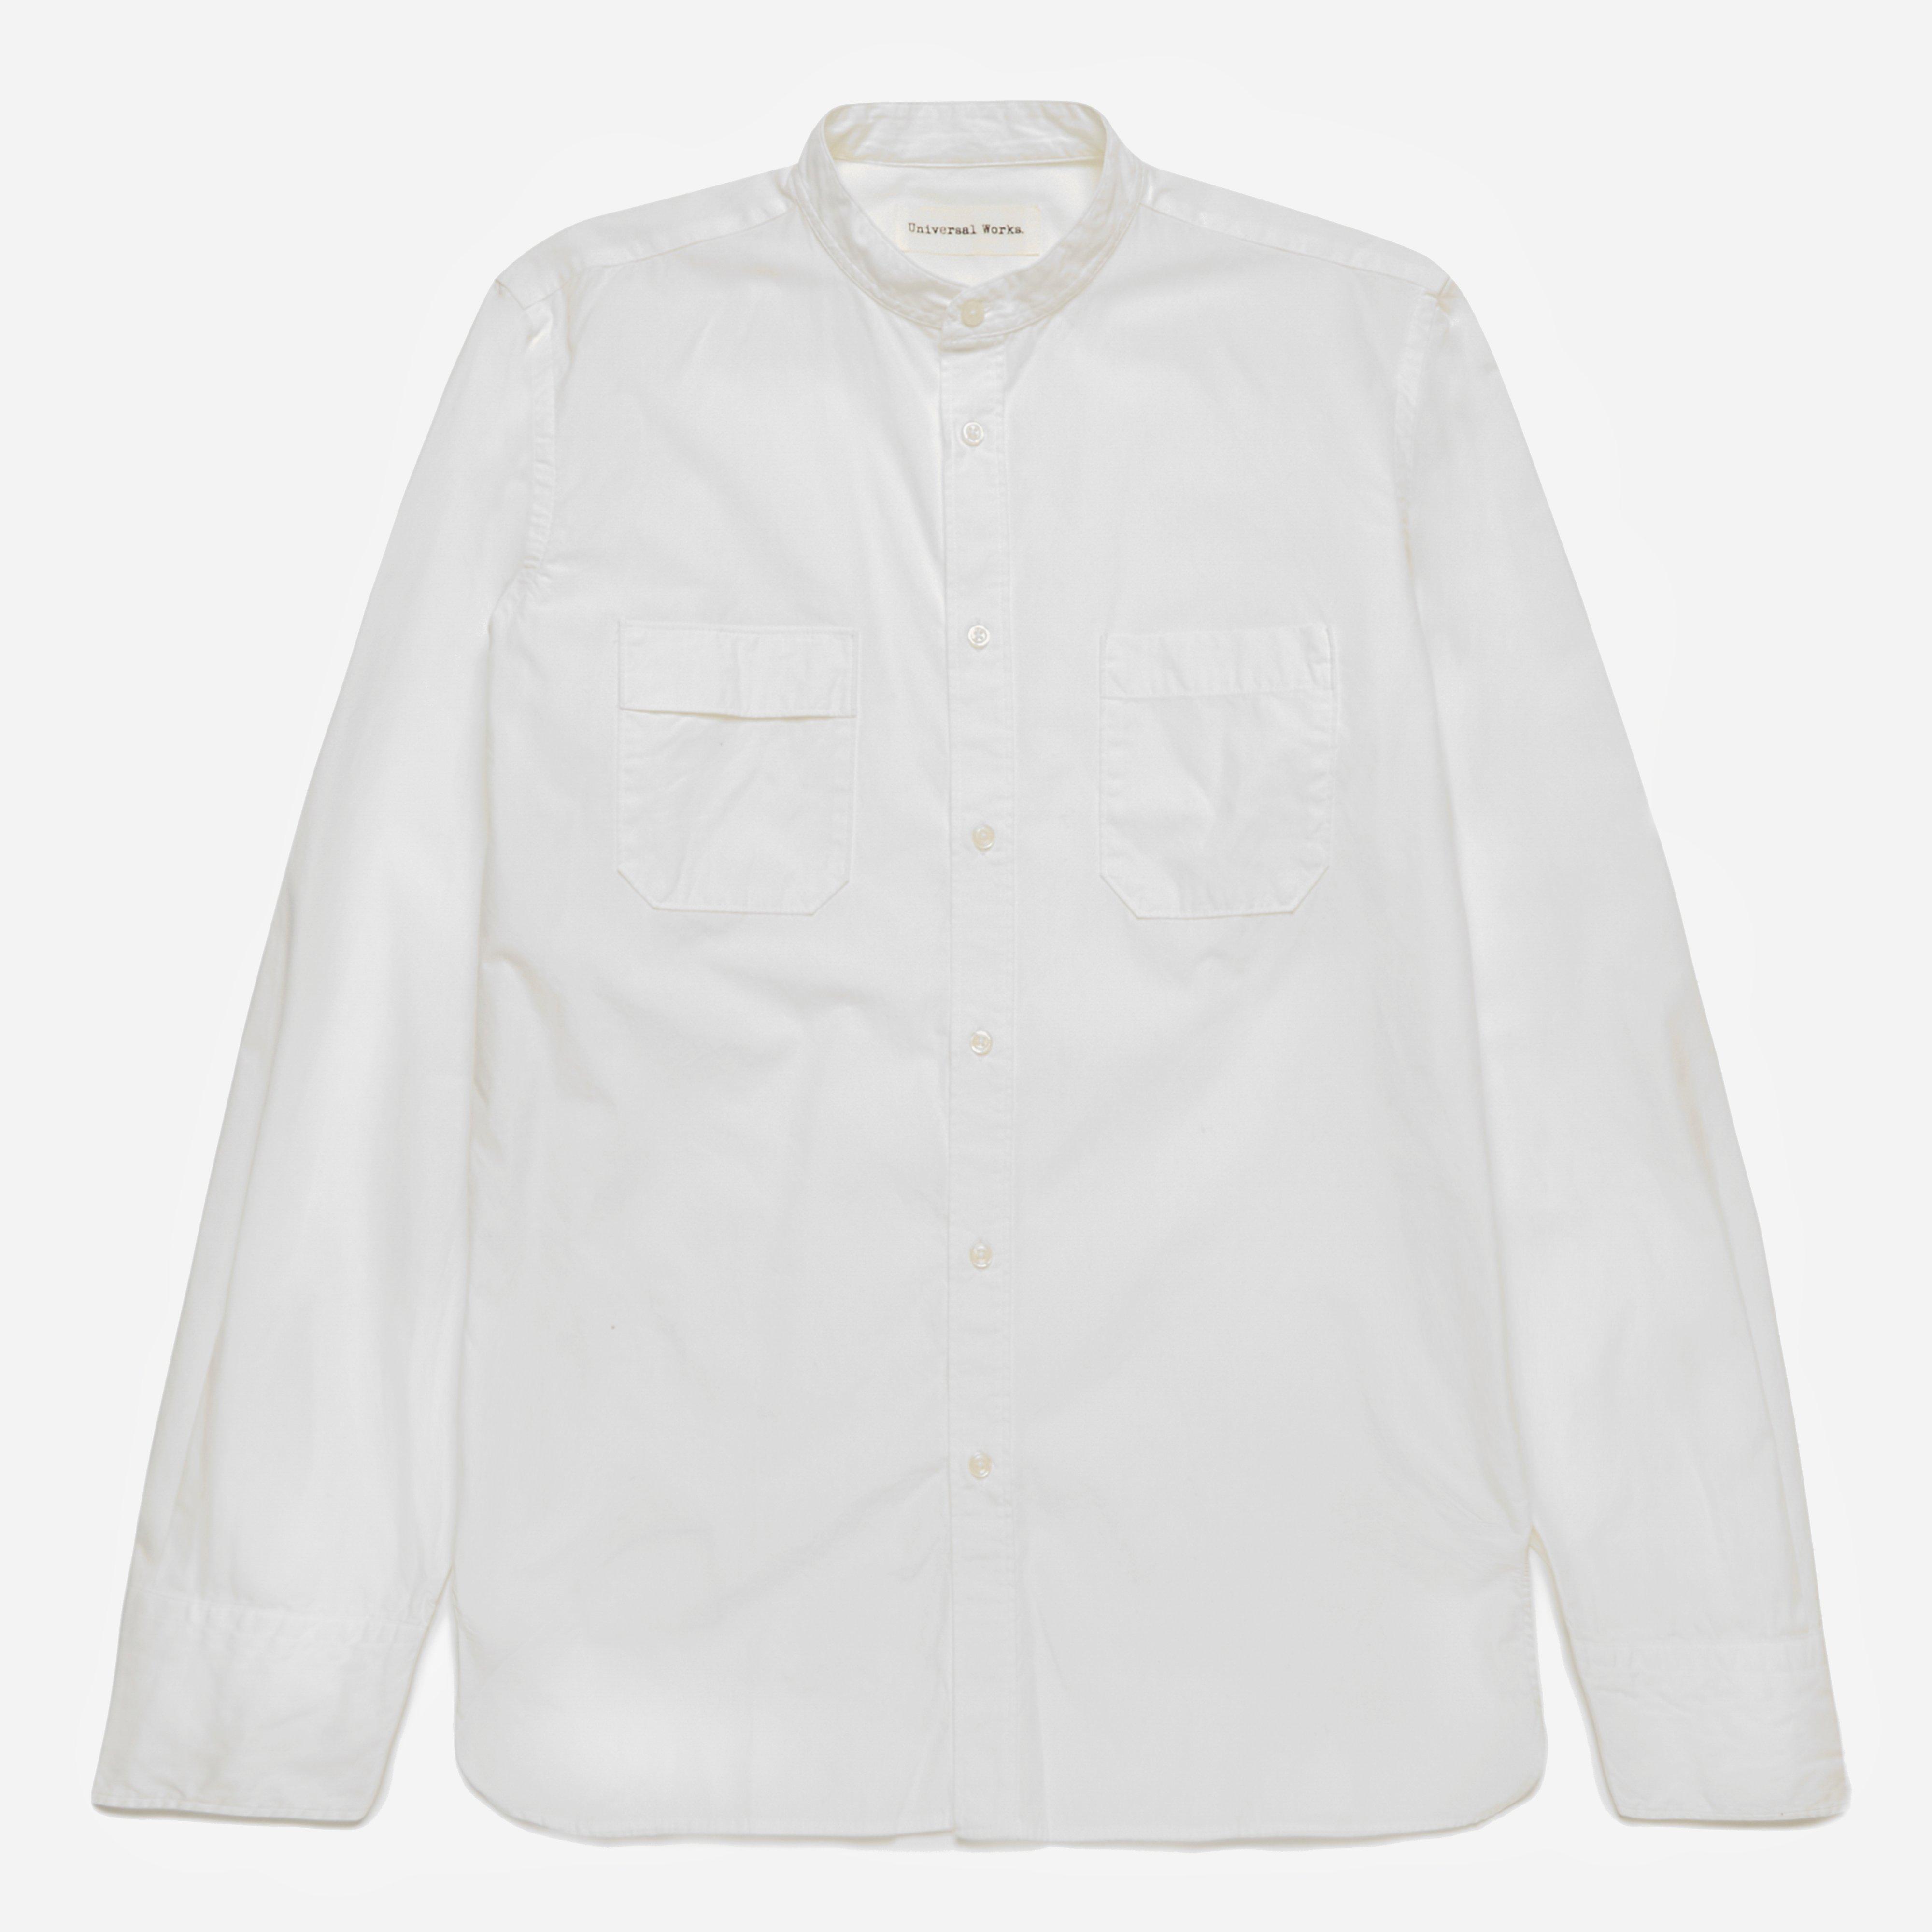 Universal Works Poplin Point Collar Shirt